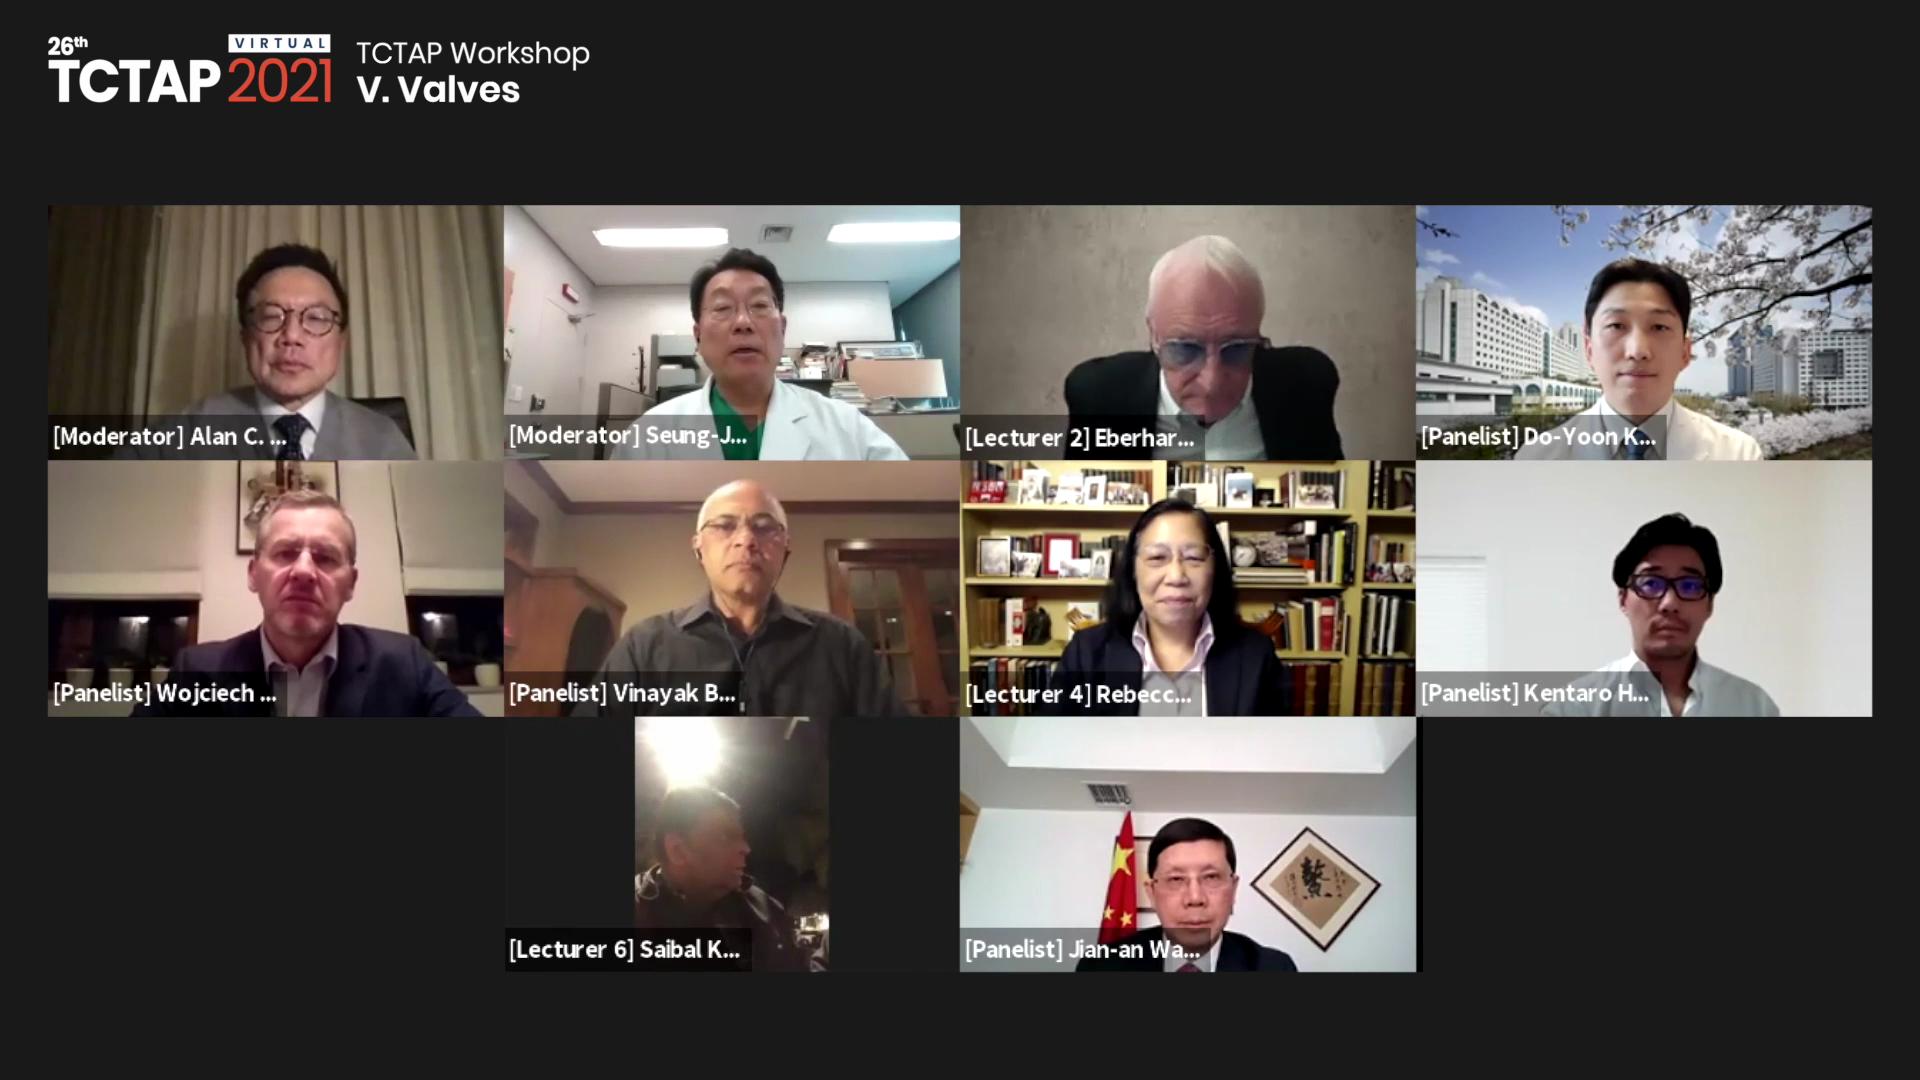 [TCTAP 2021 Virtual] TCTAP Workshop - V. Valves